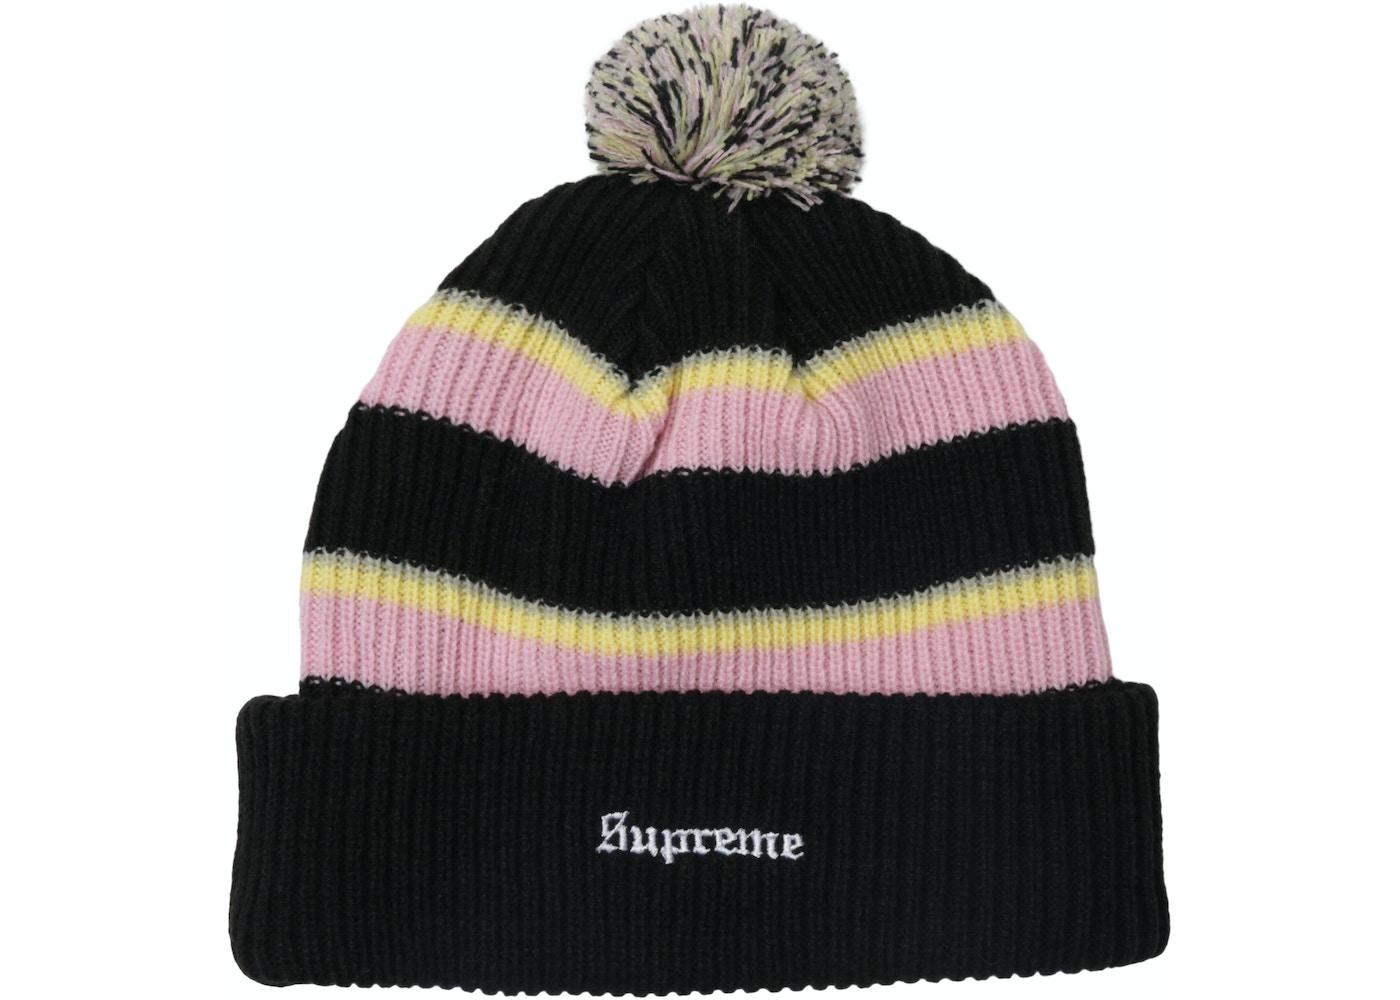 36d8860887d Supreme Big Stripe Beanie Black - FW17